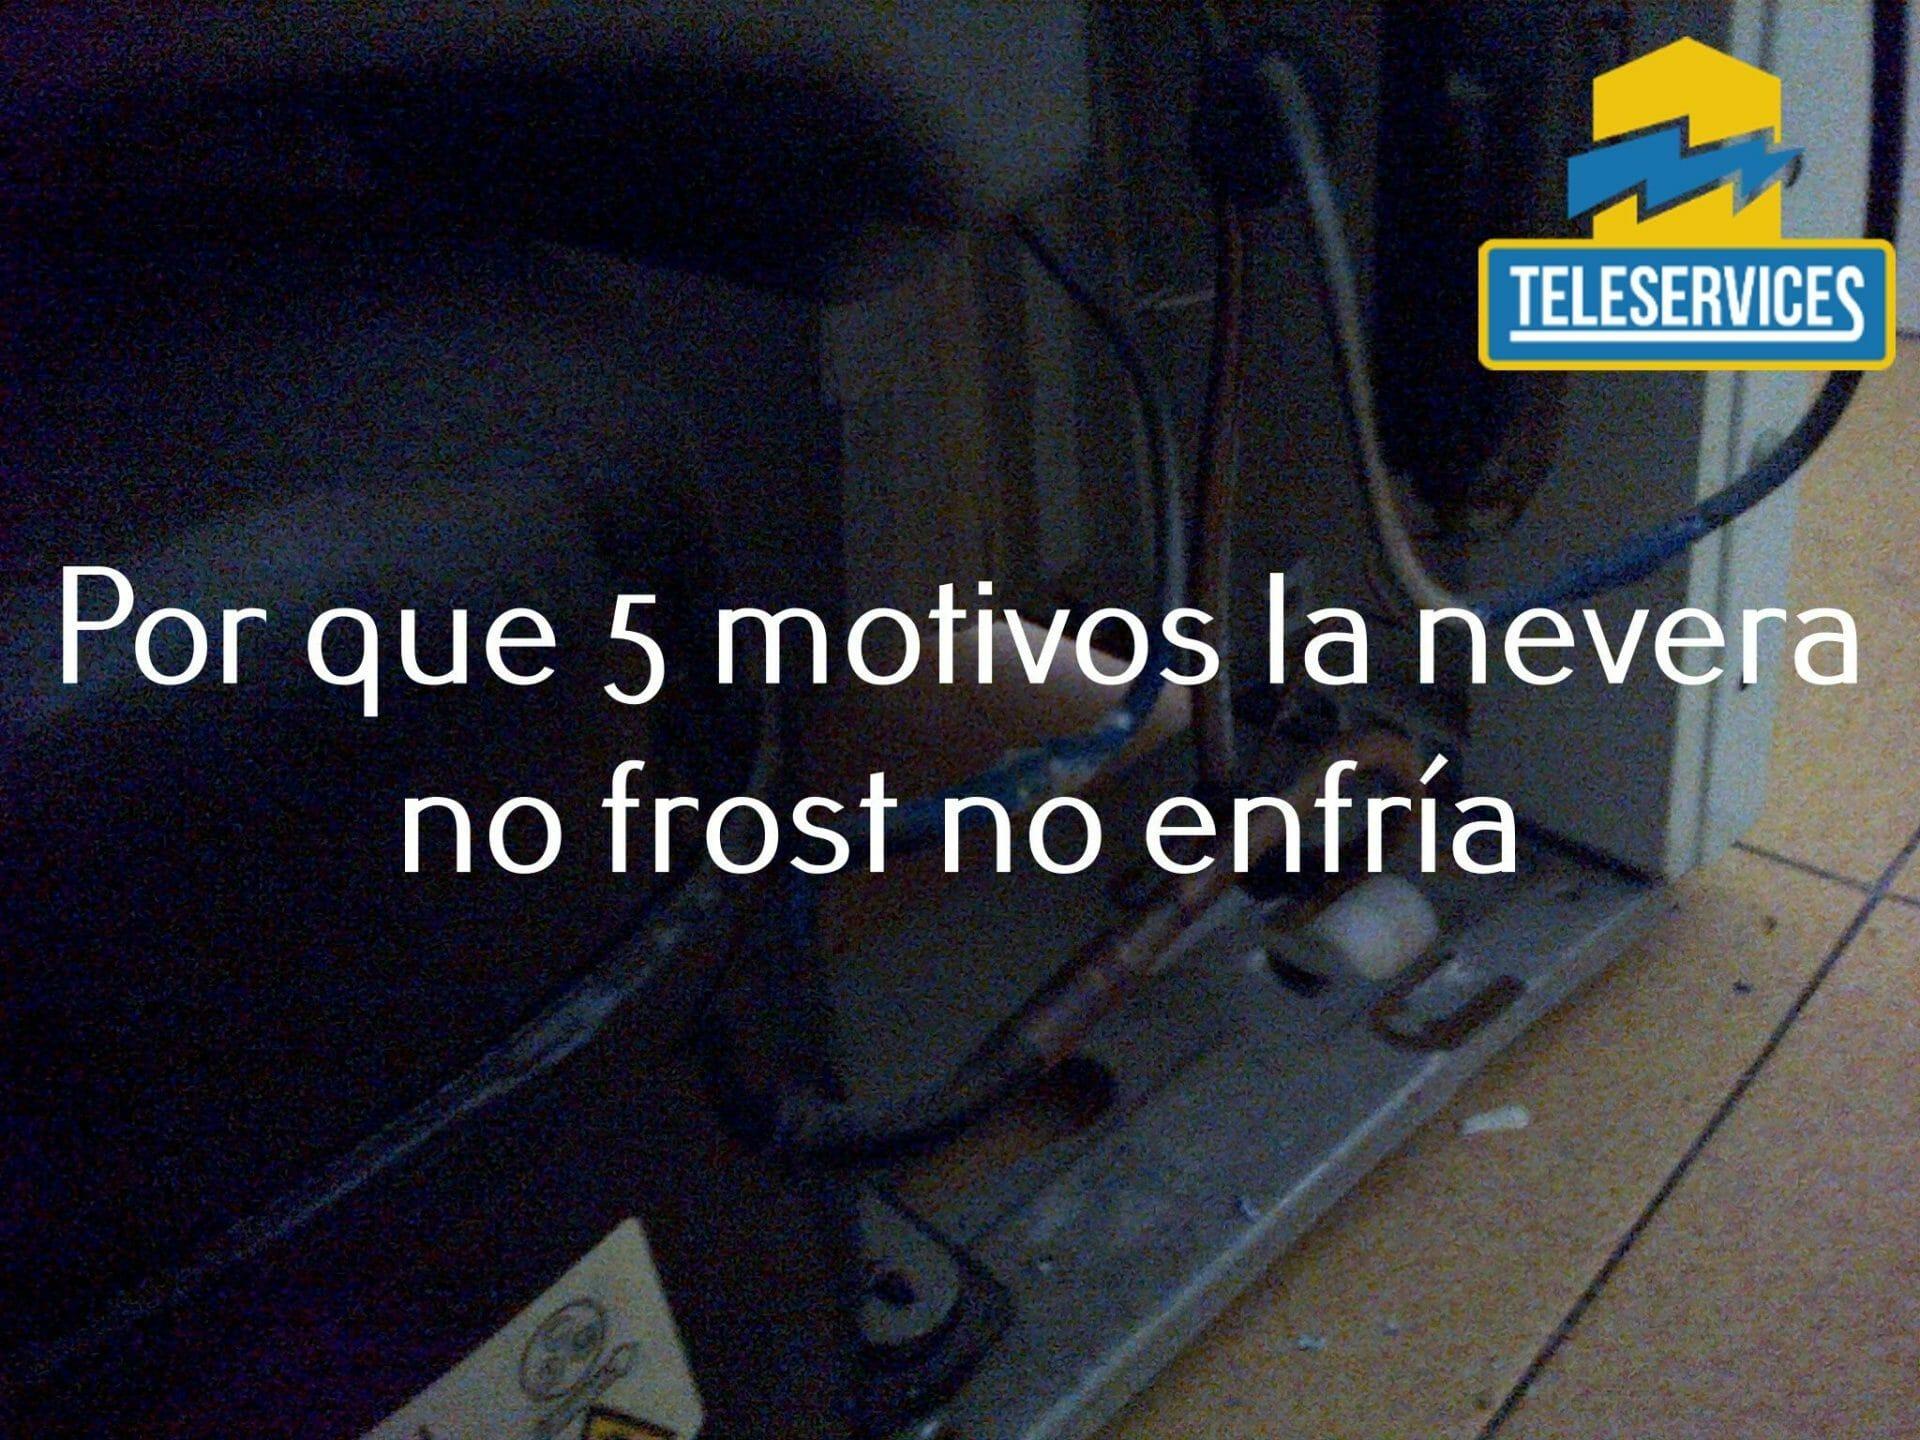 nevera no frost no enfria